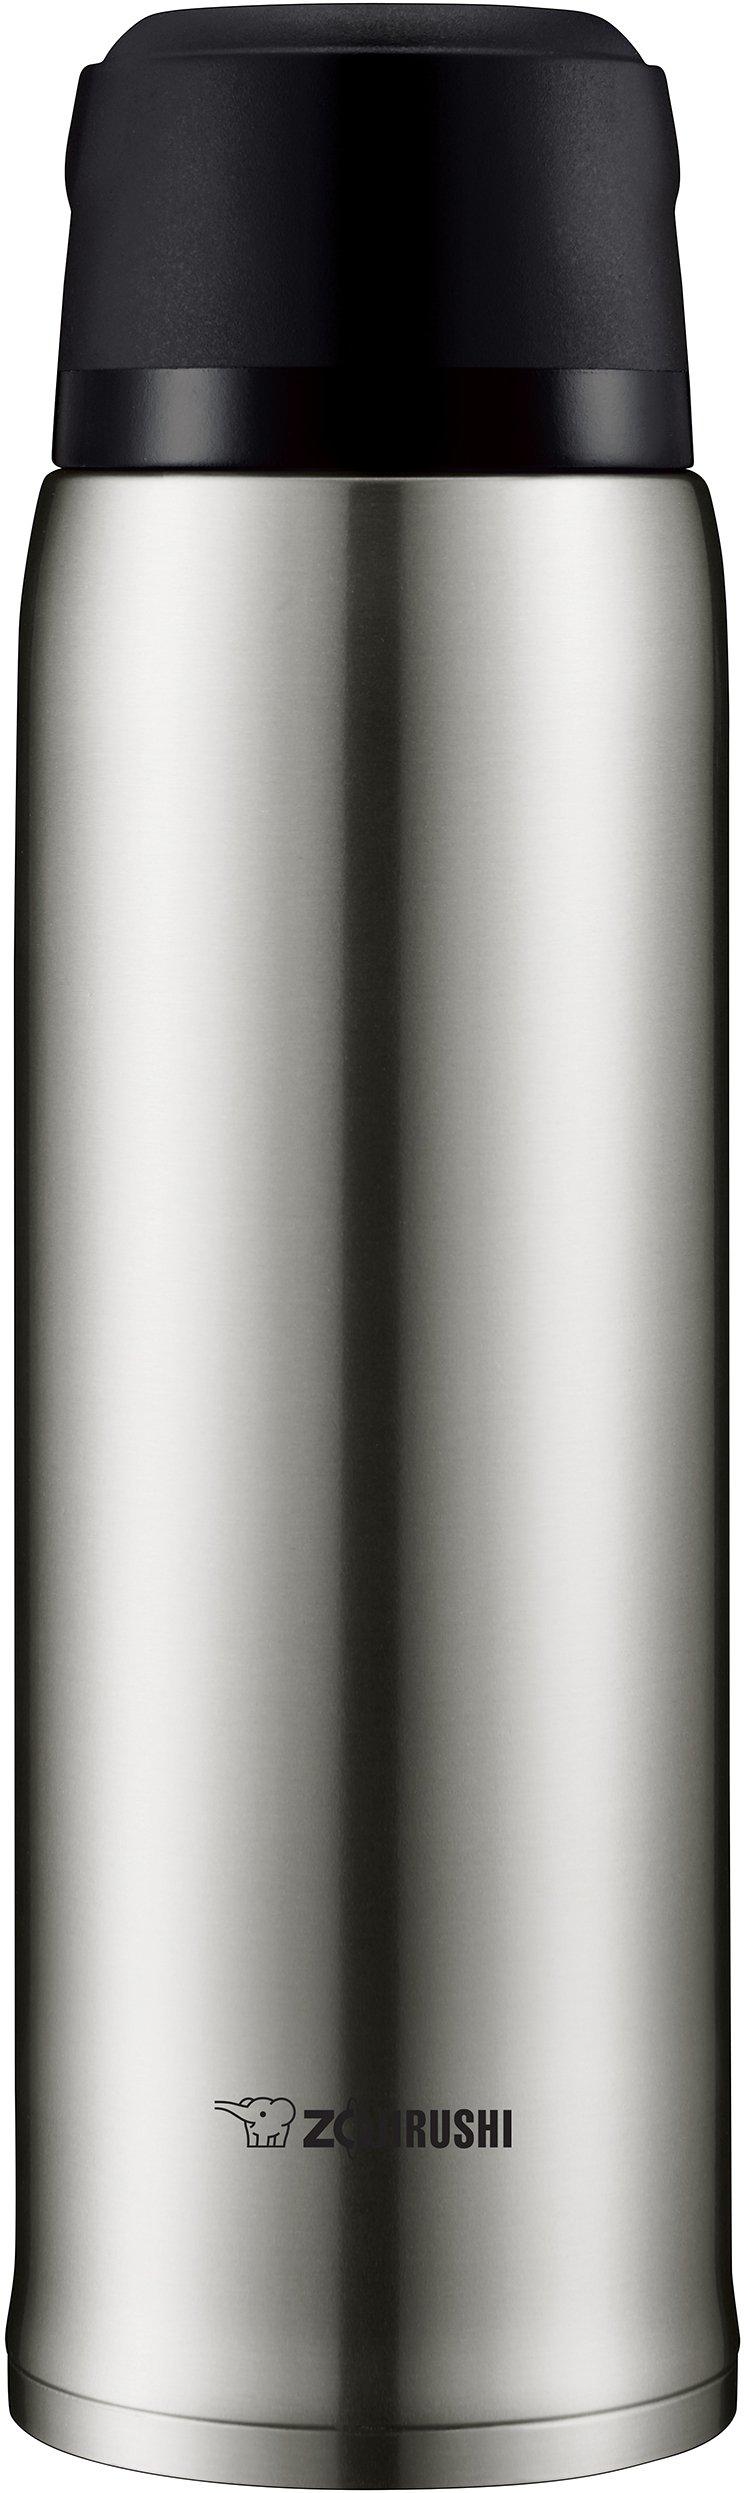 Zojirushi SJ-JS10XA Stainless Steel Bottle Mug, Silver